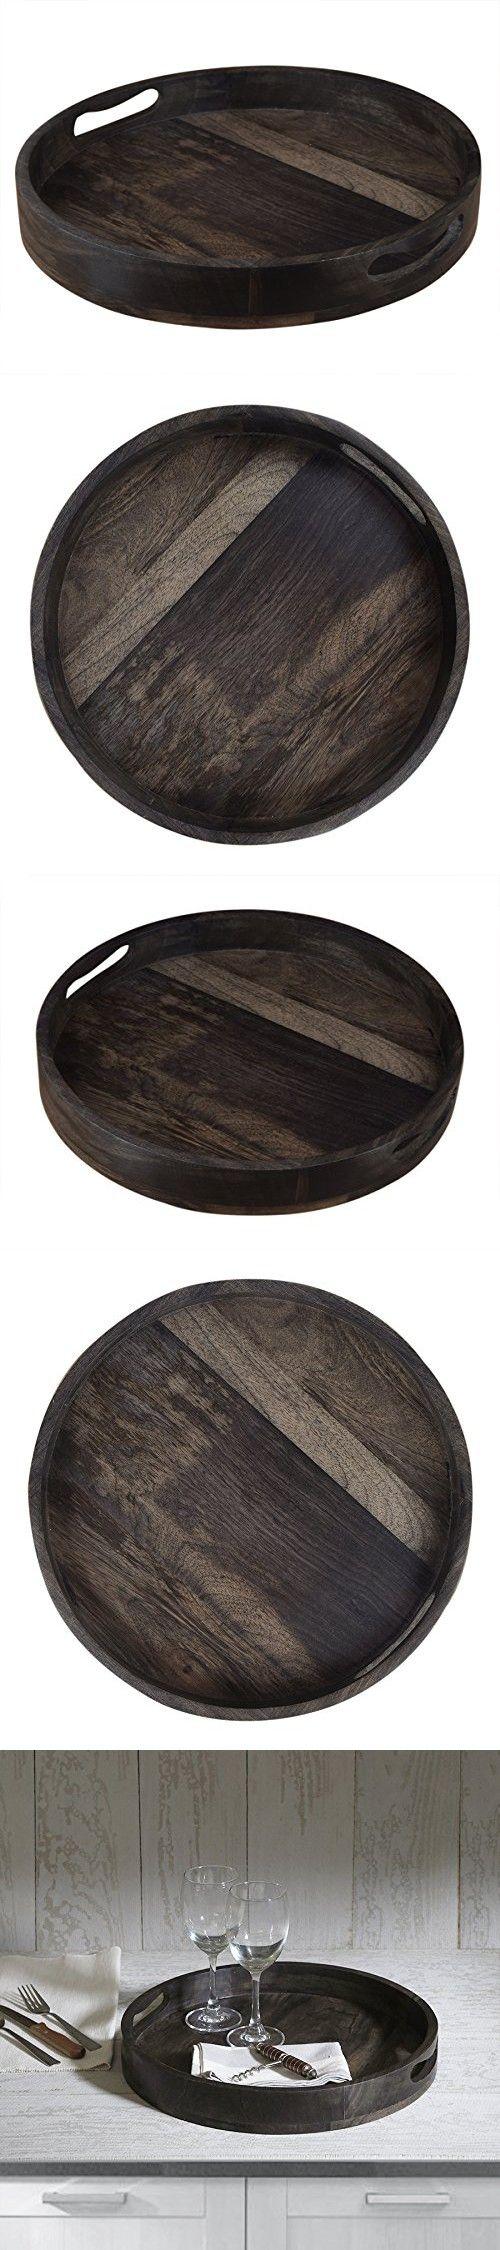 Large Decorative Serving Trays Captivating 428 Best Decorative Trays Images On Pinterest  Decorative Trays Design Ideas